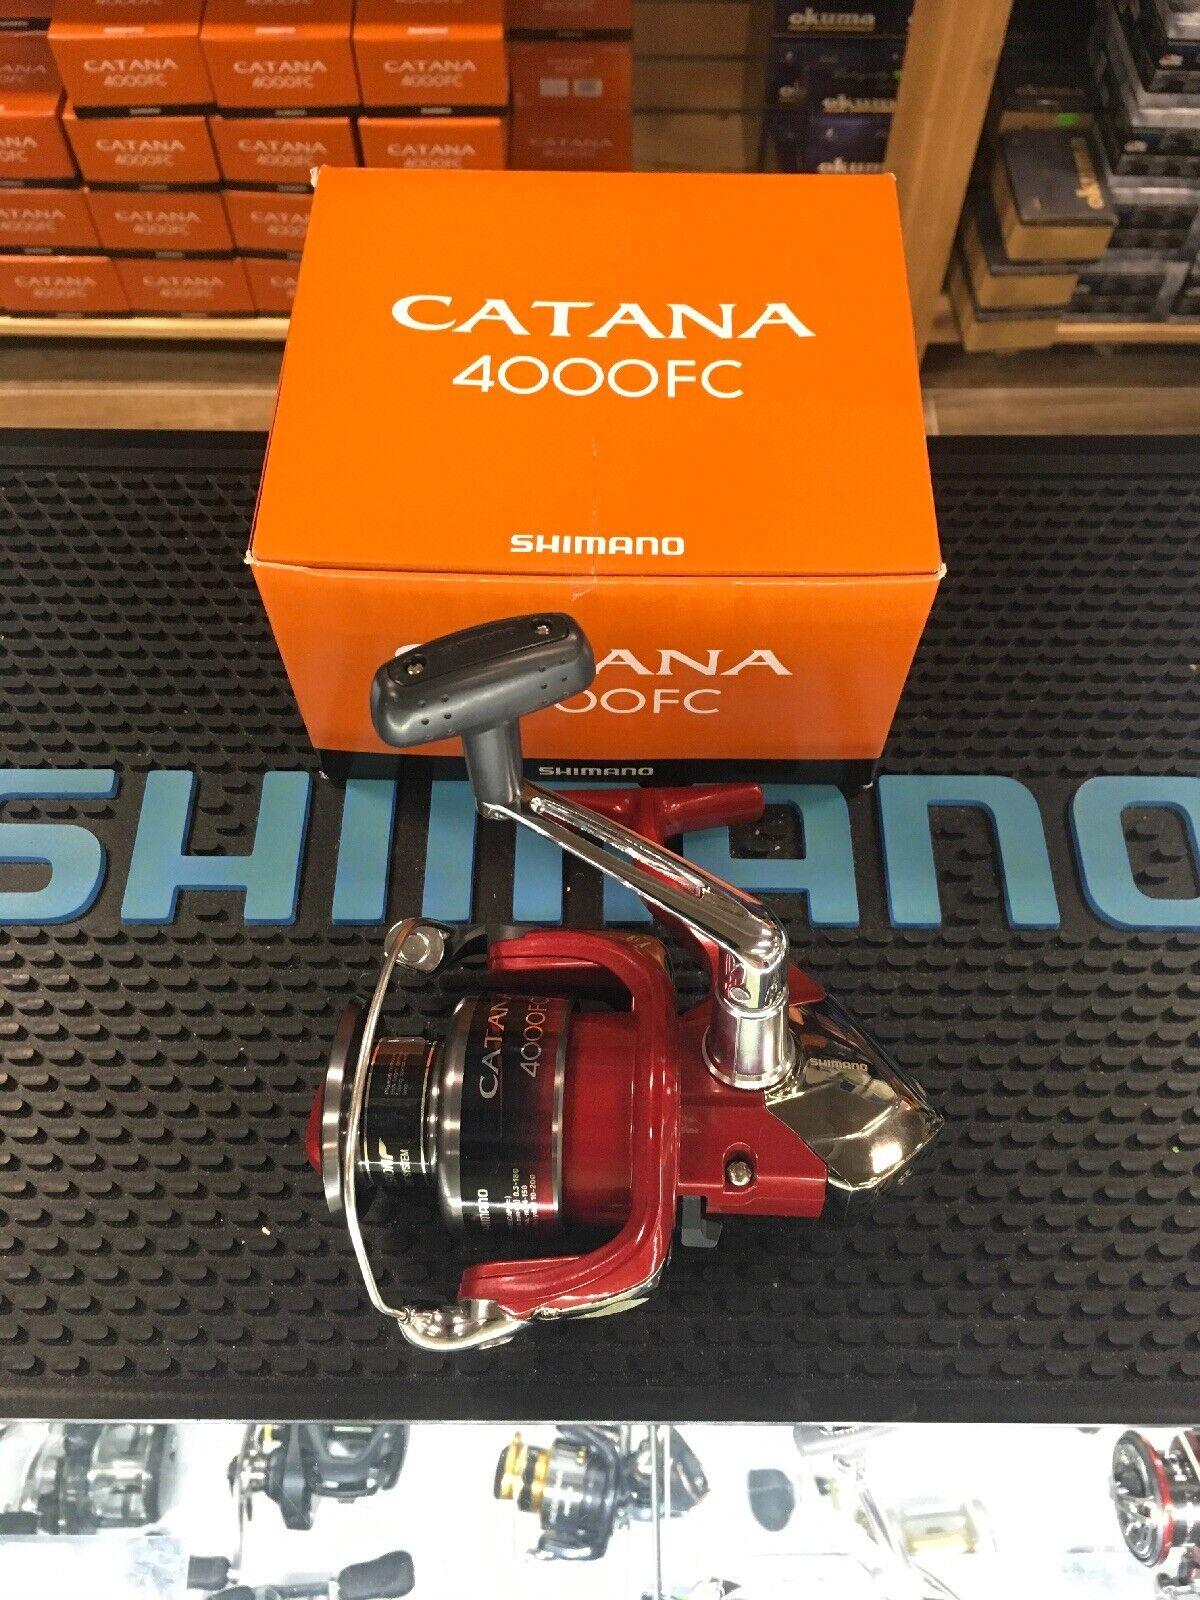 SHIMANO CATANA 4000FC  Spinning Reel  on sale